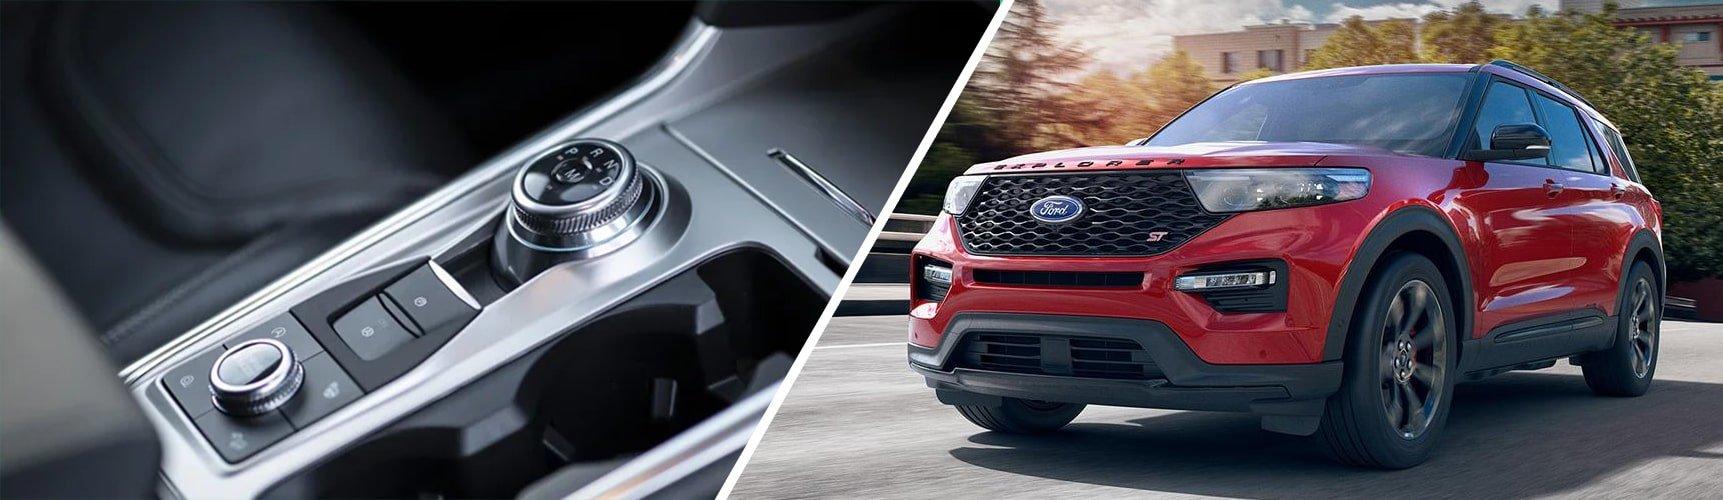 2020 Ford Explorer | High-Tech Features